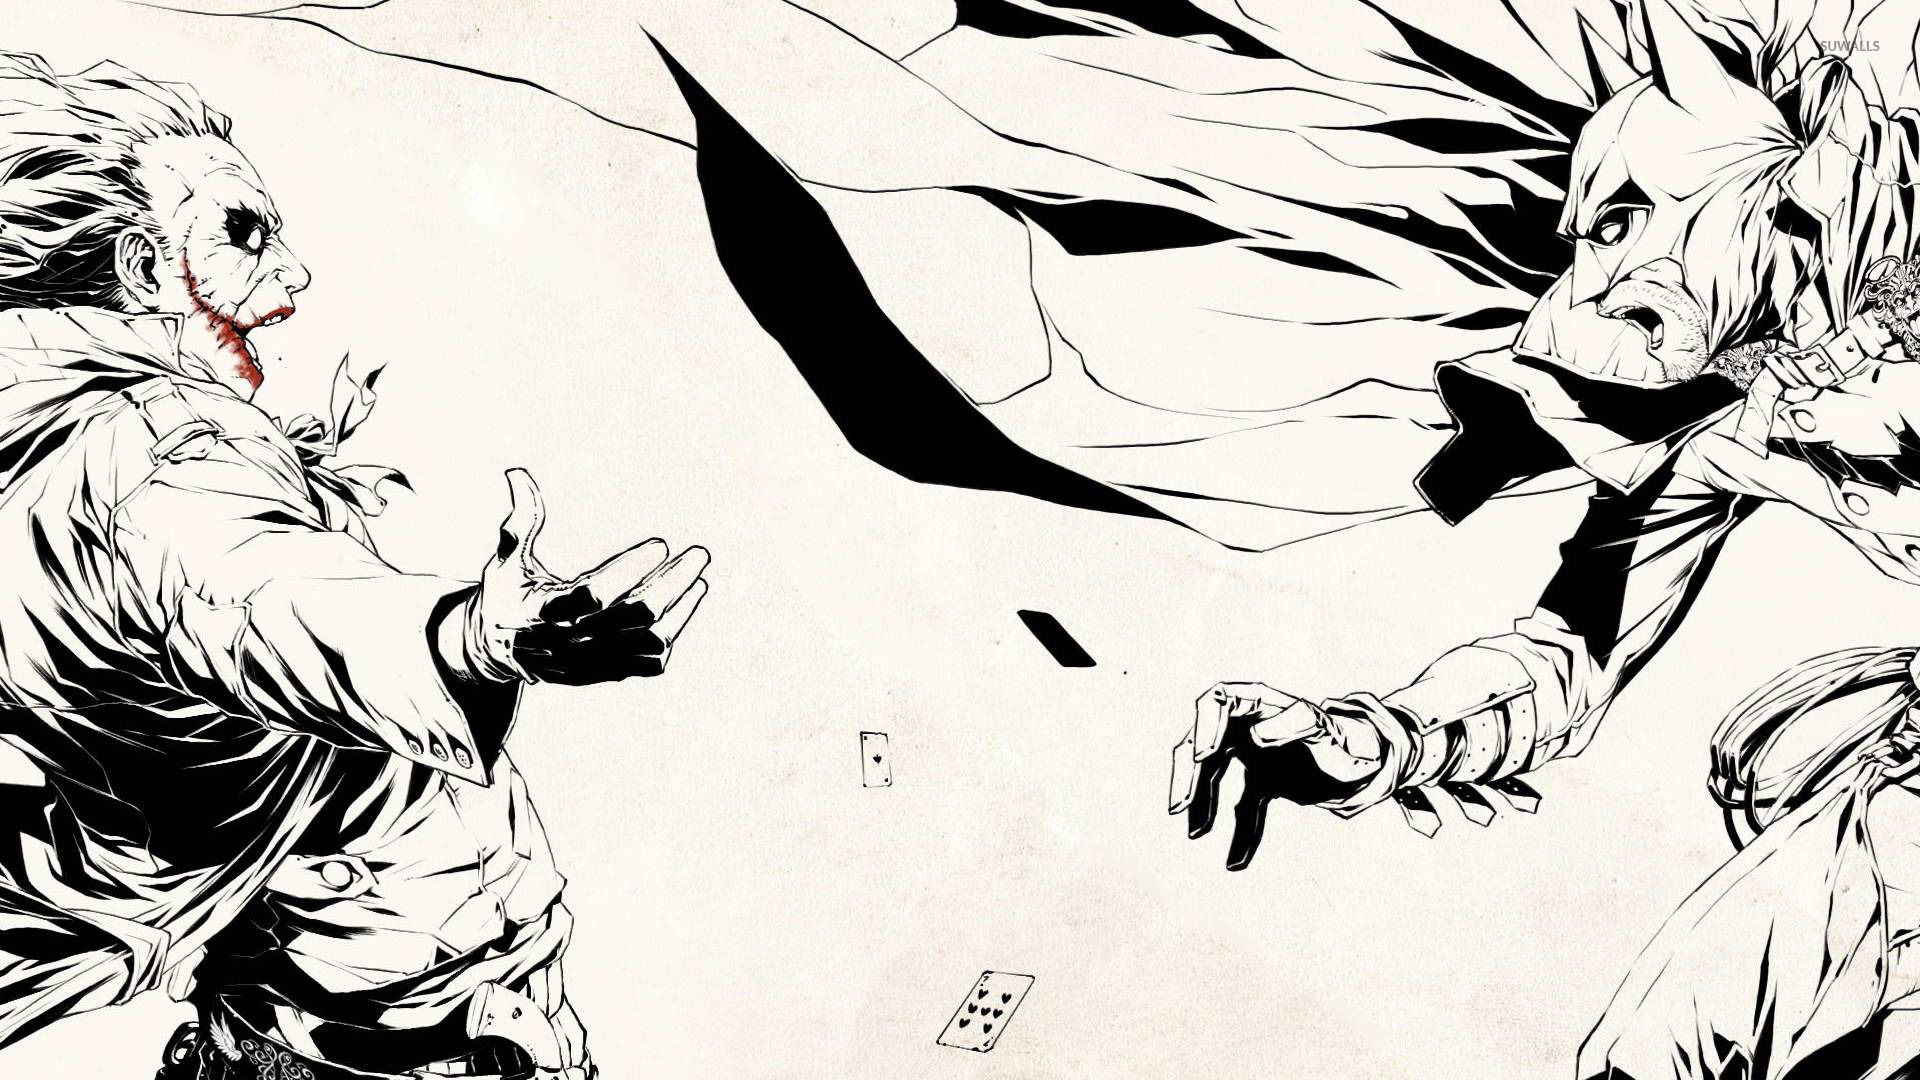 1920x1080 Batman Vs Joker Wallpaper